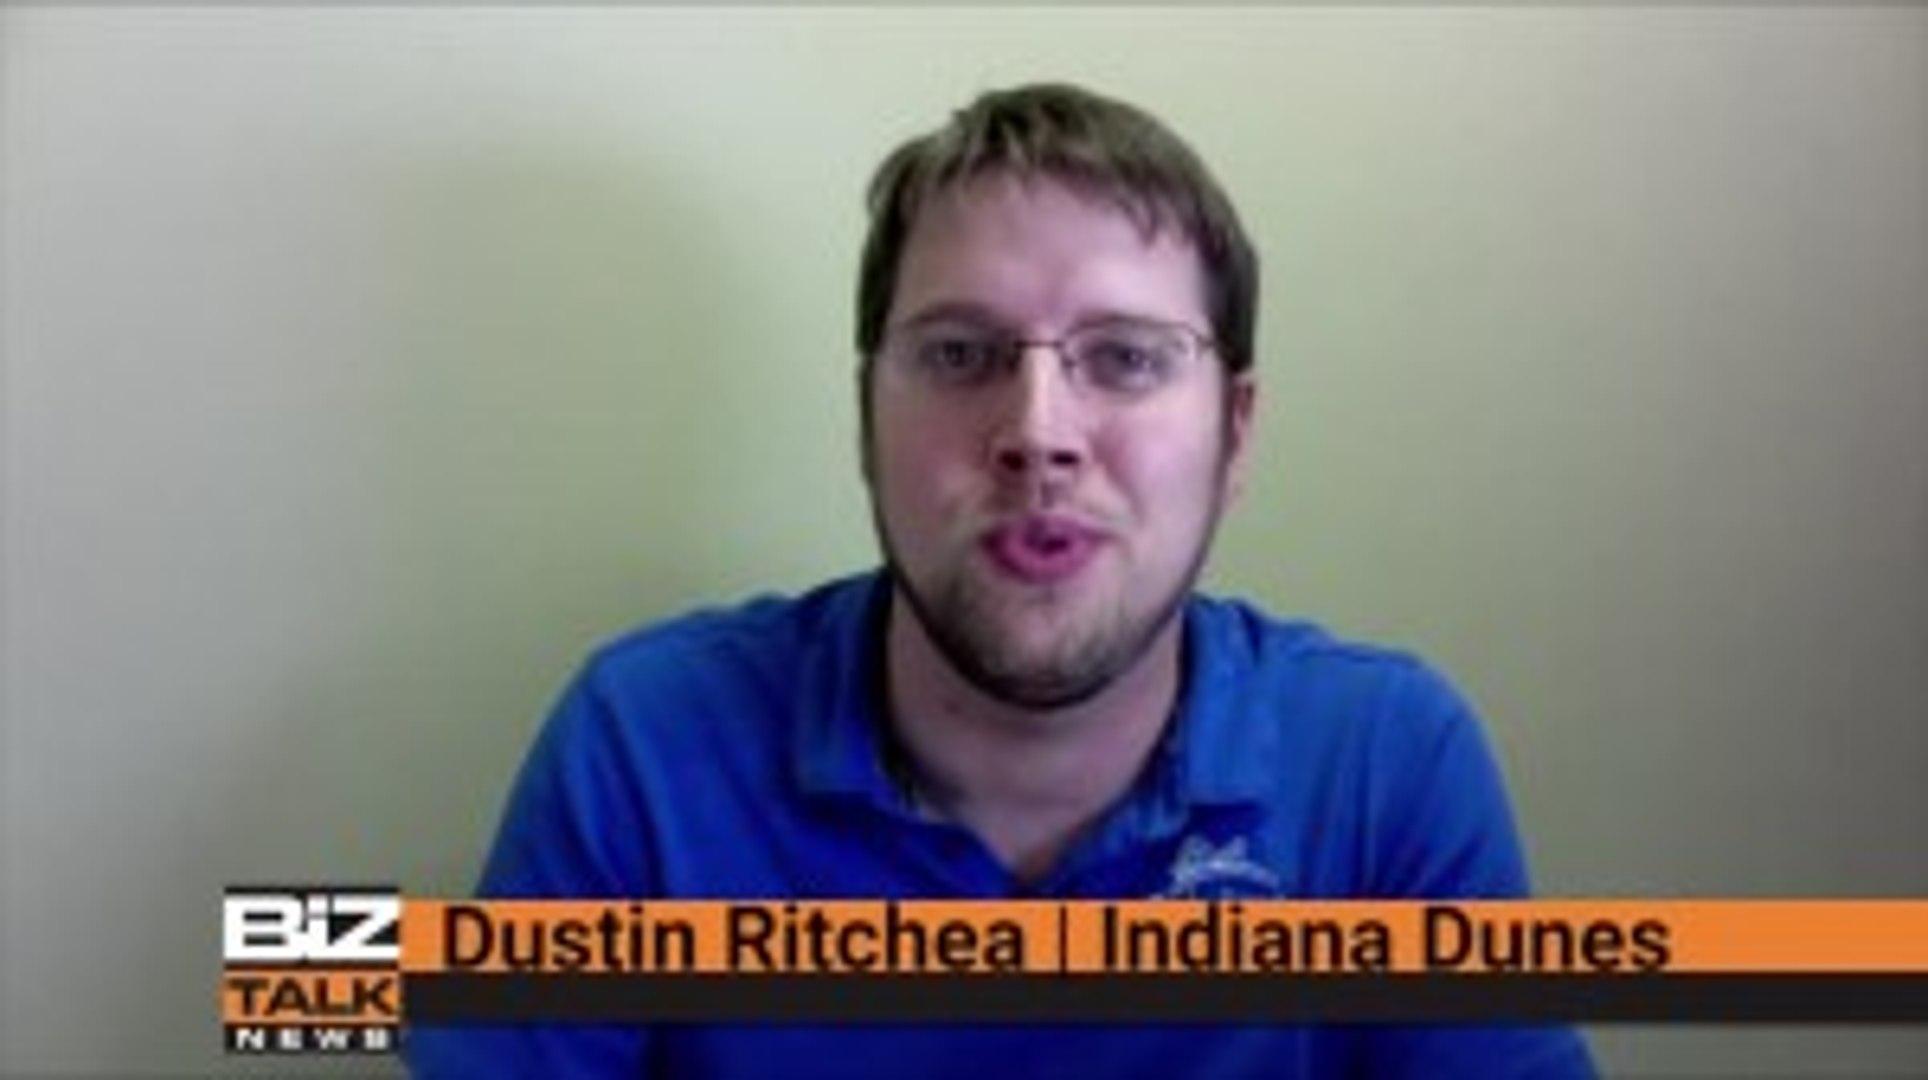 BizTalk Discovery: Indiana Dunes